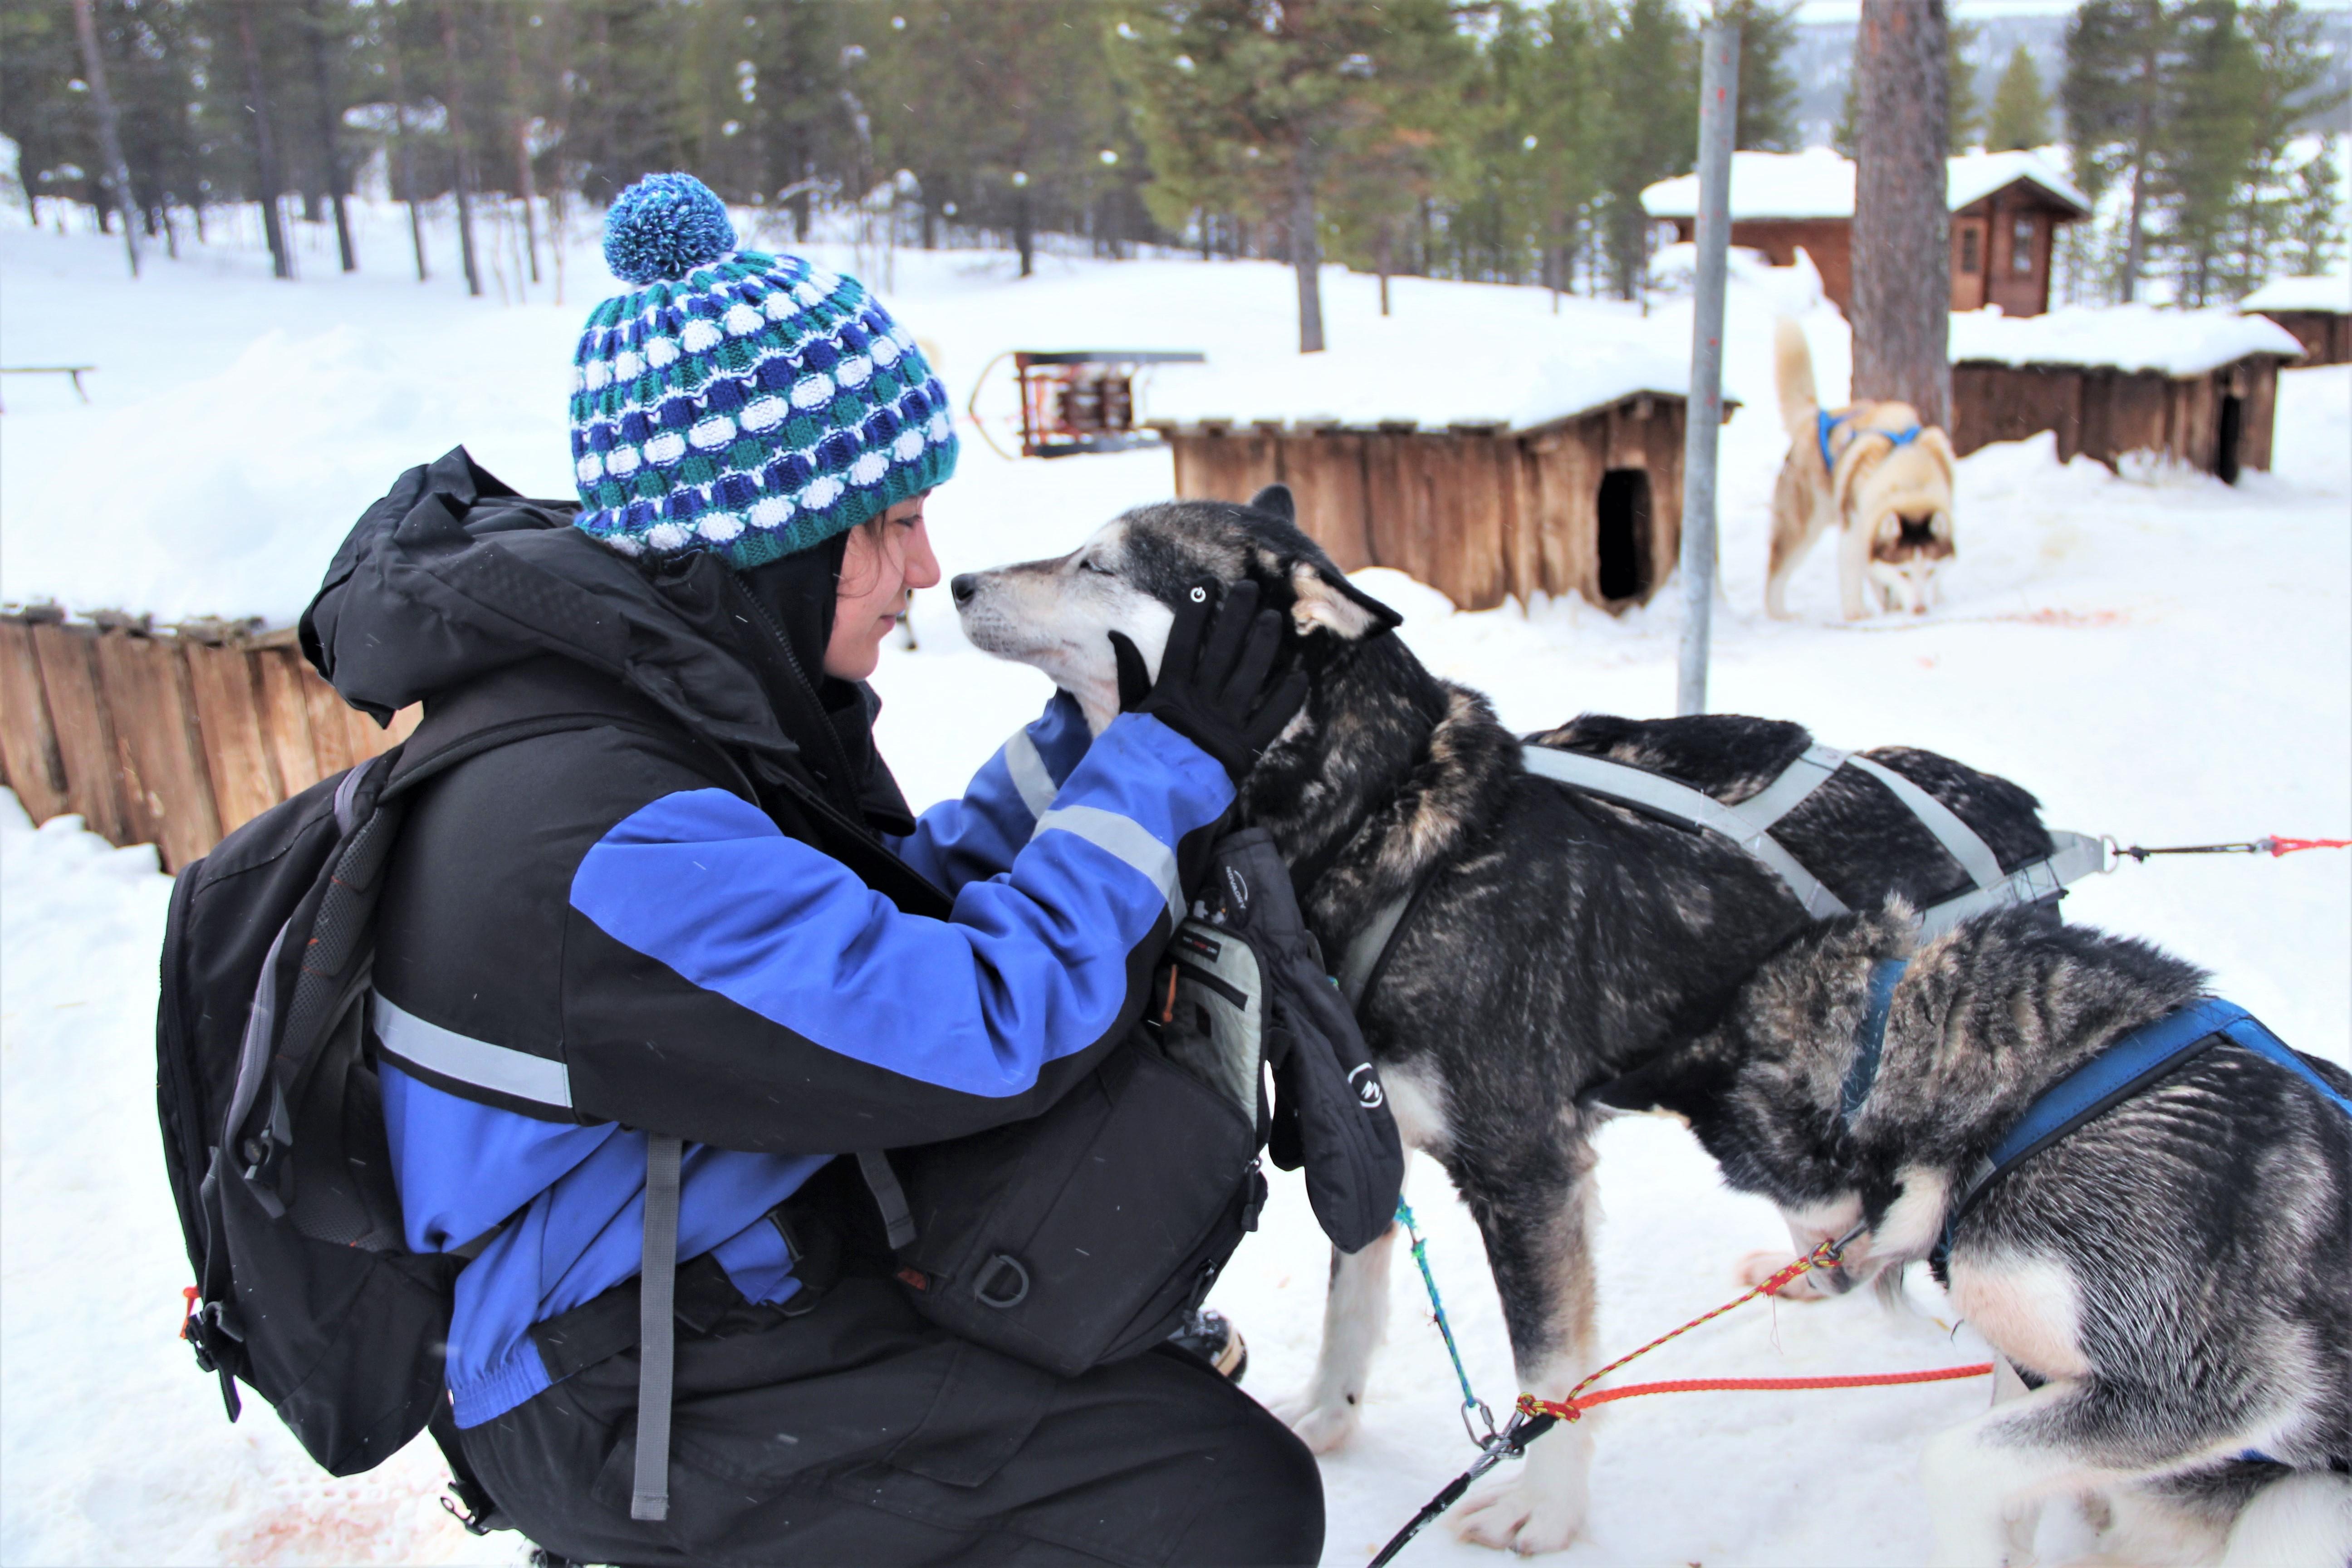 chiens-calin-kiruna-suede-mylittleroad